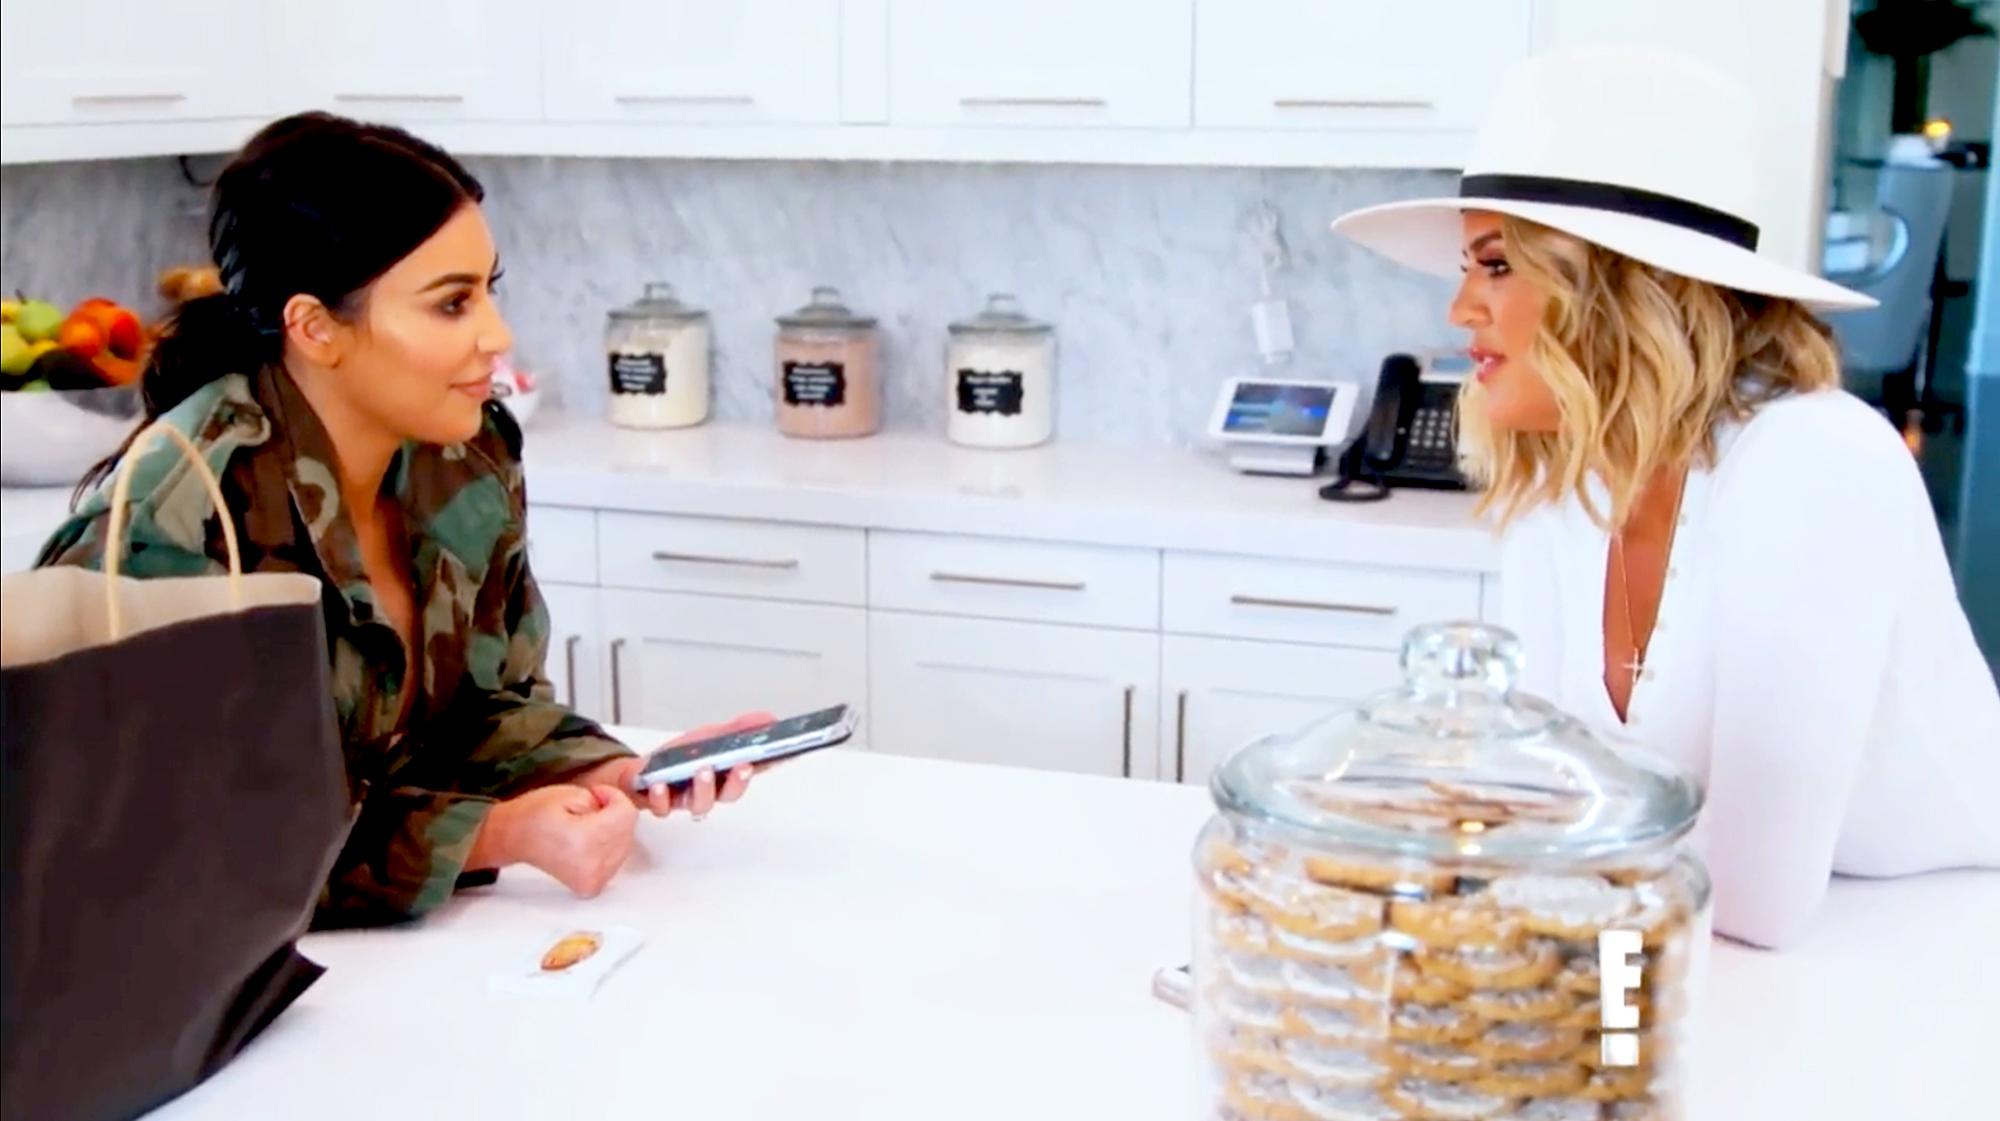 Kim Kardashian and Khloe Kardashian